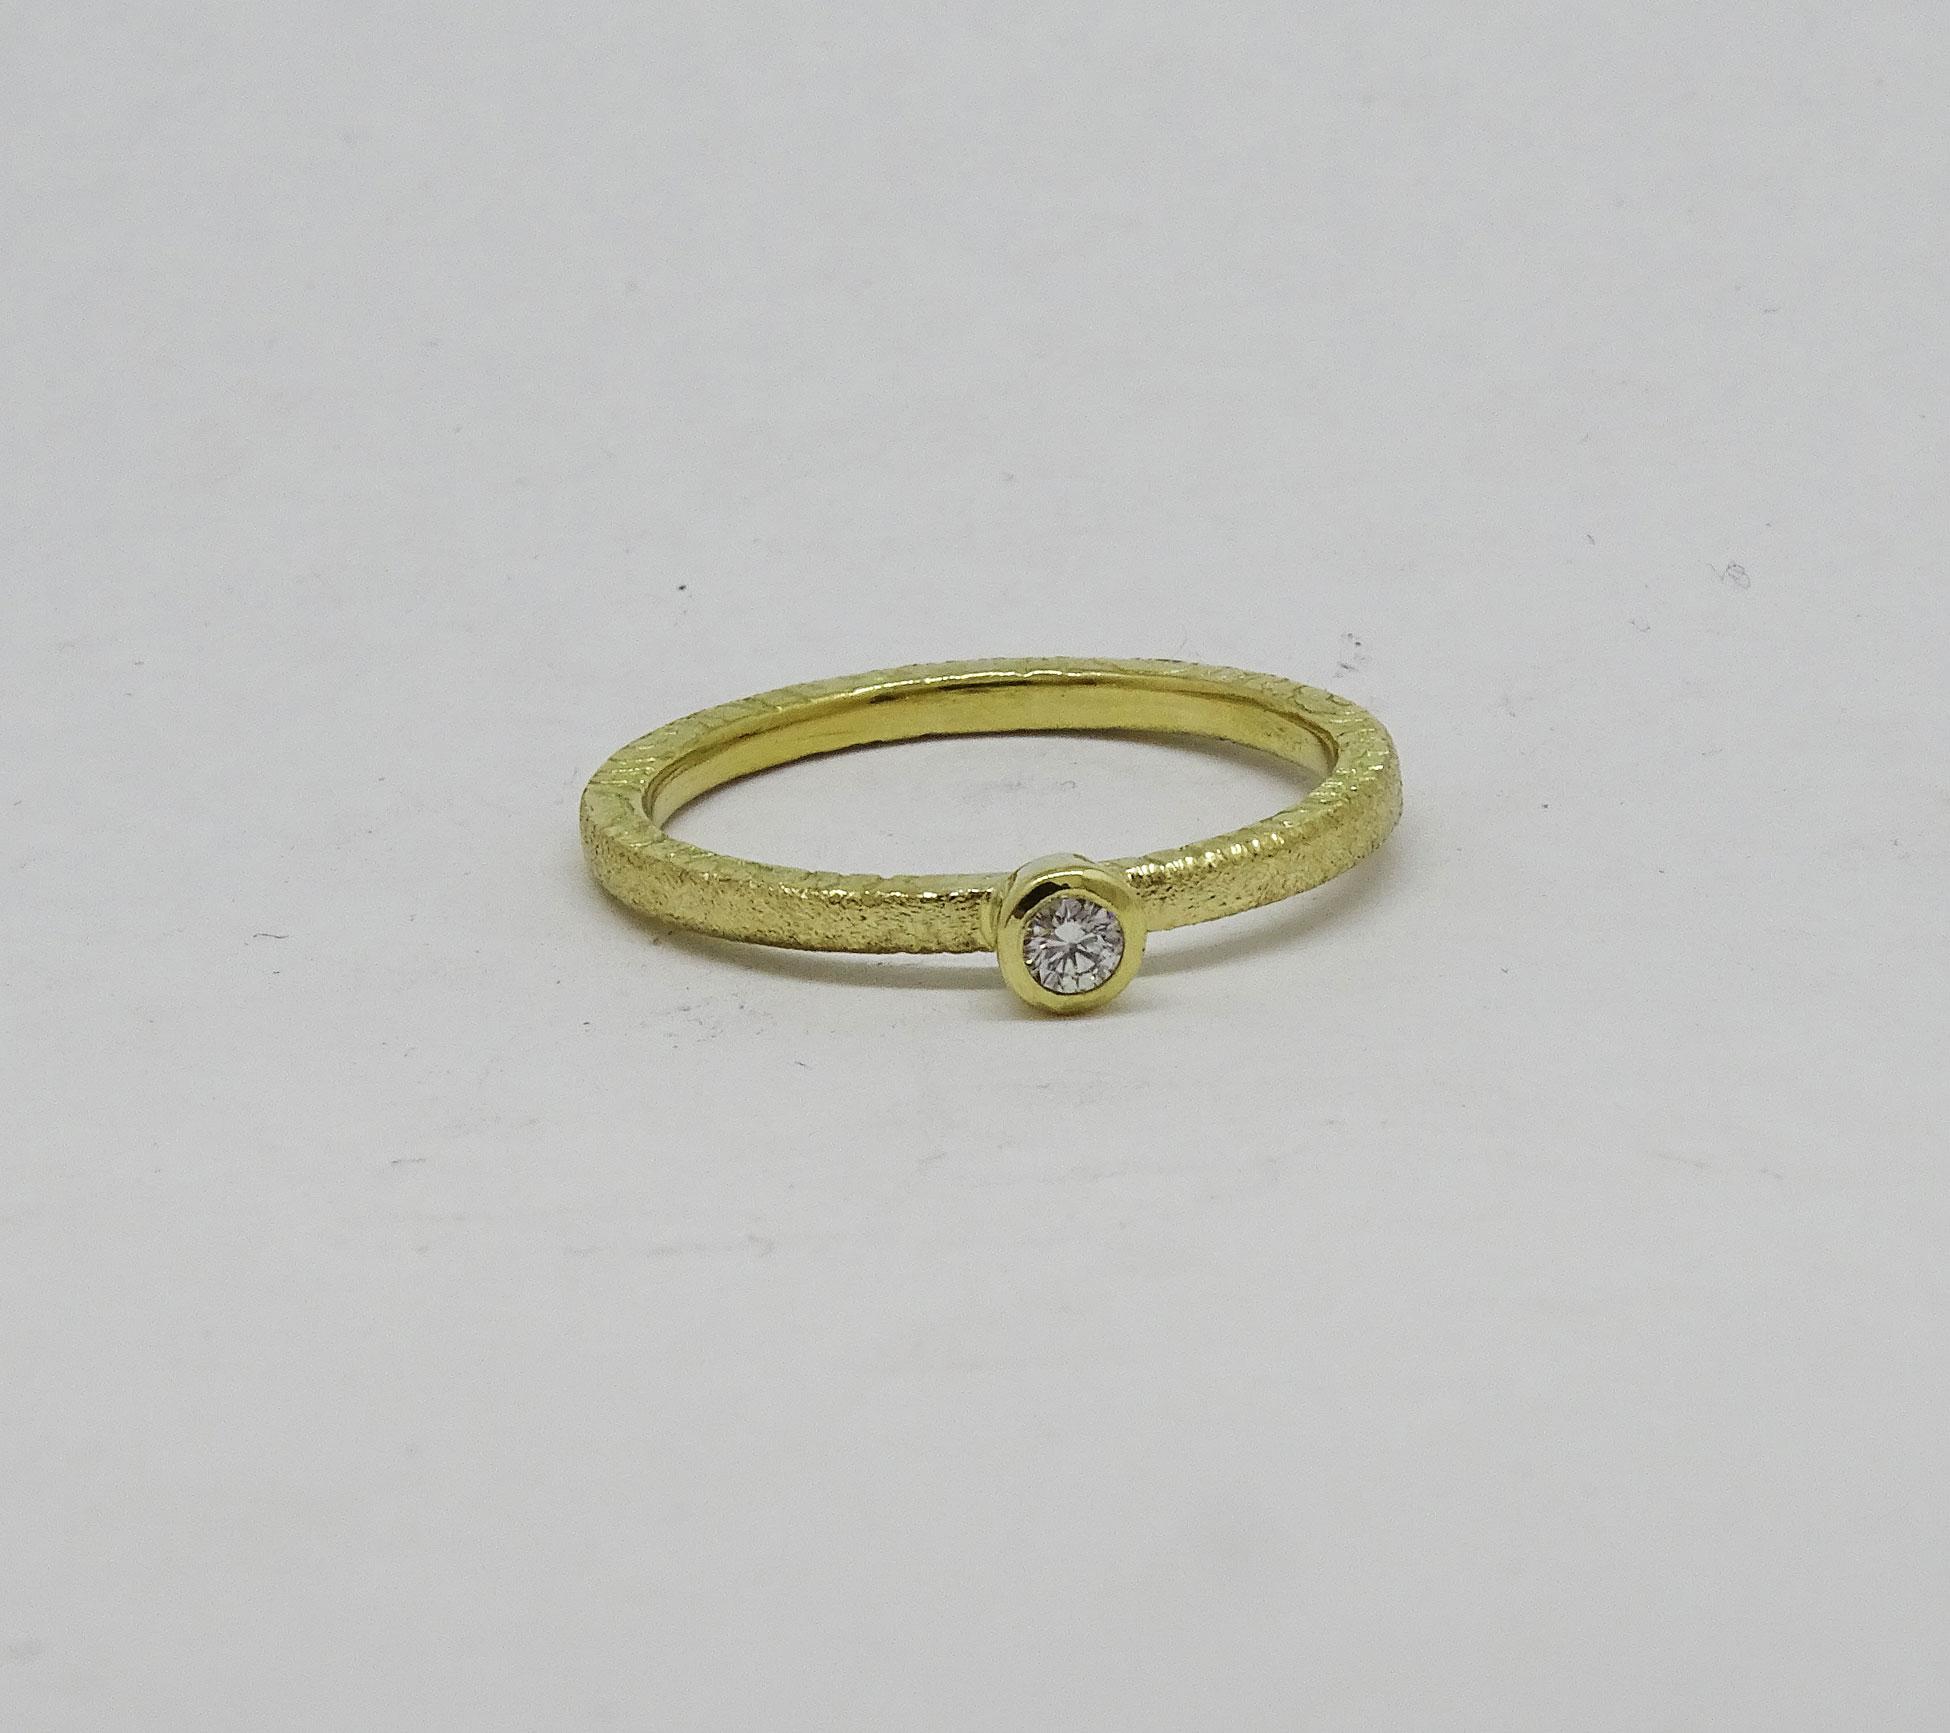 Irish handcrafted ring